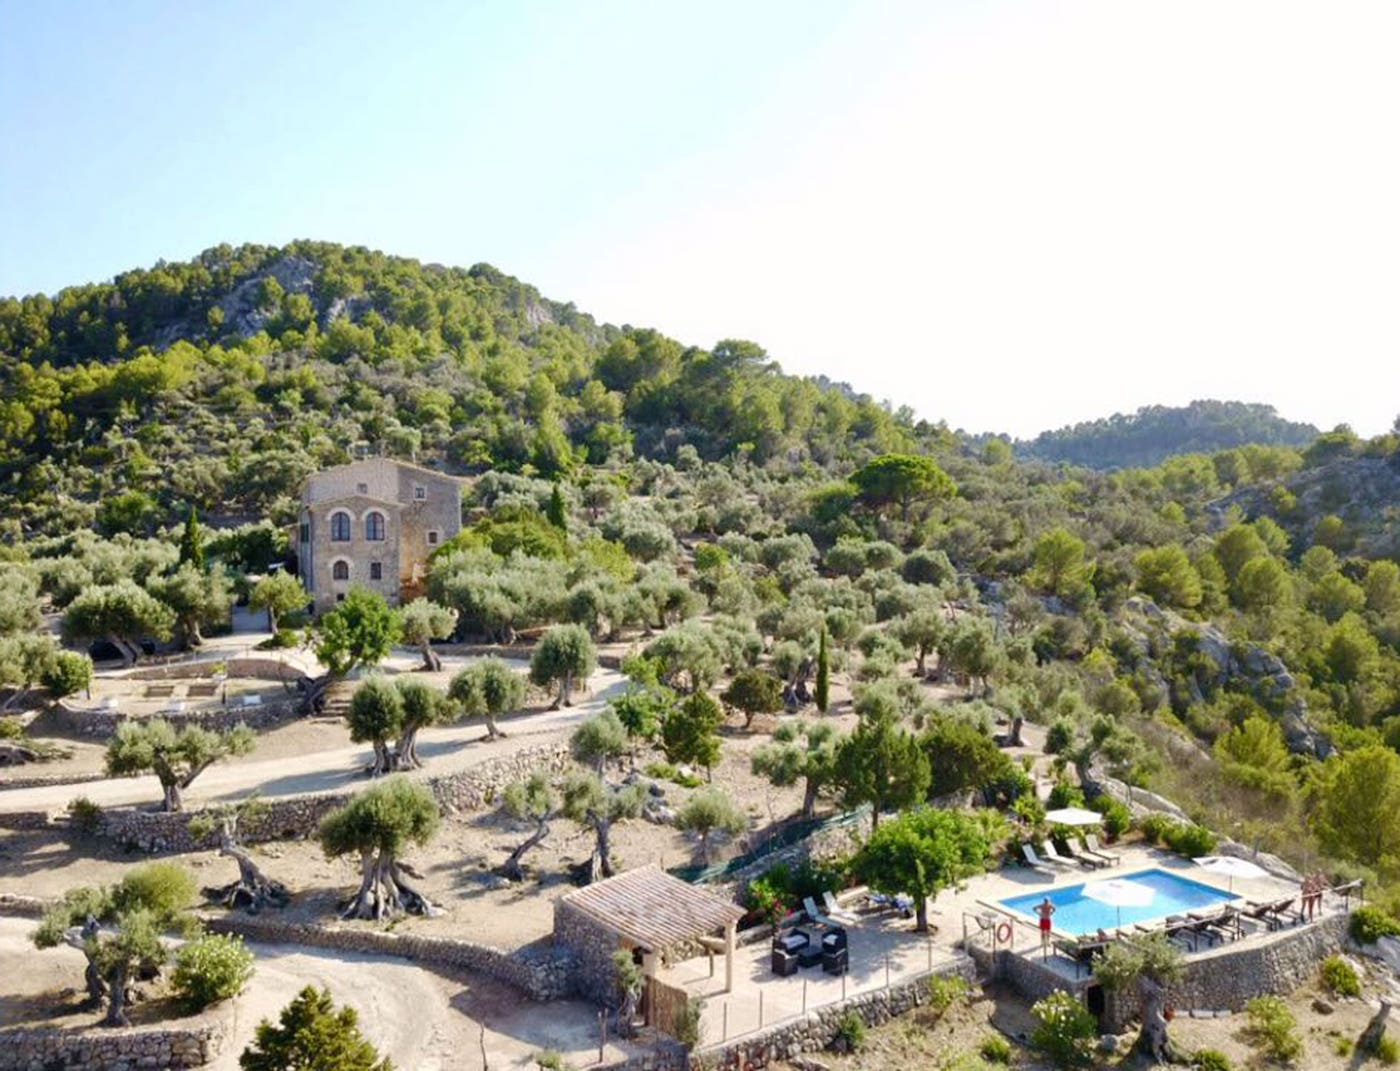 finca in the mountain for wedding location in Mallorca